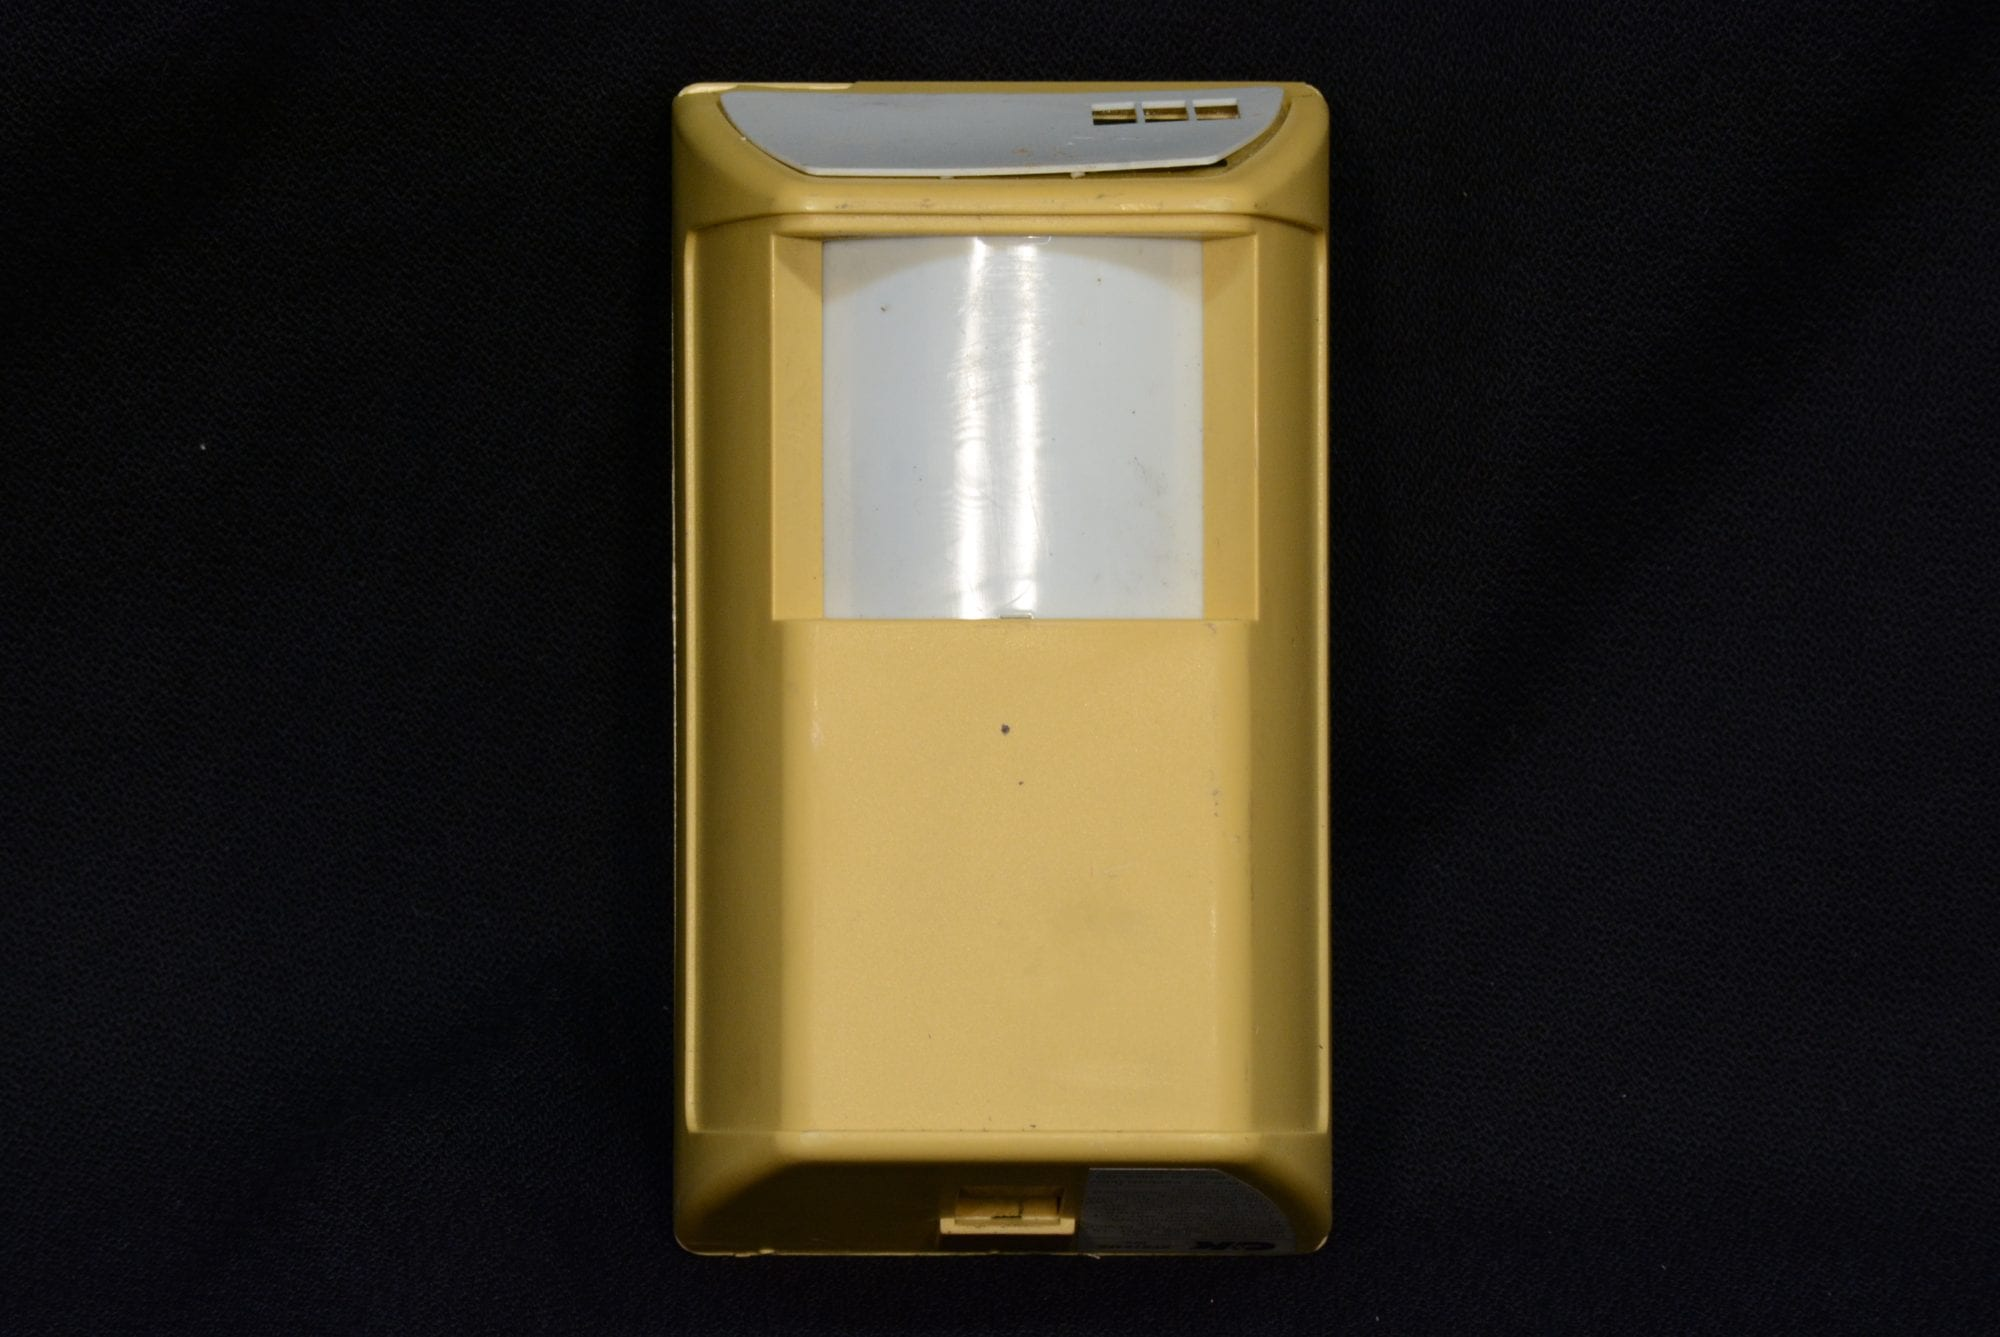 C And K Pir Microwave Motion Detector